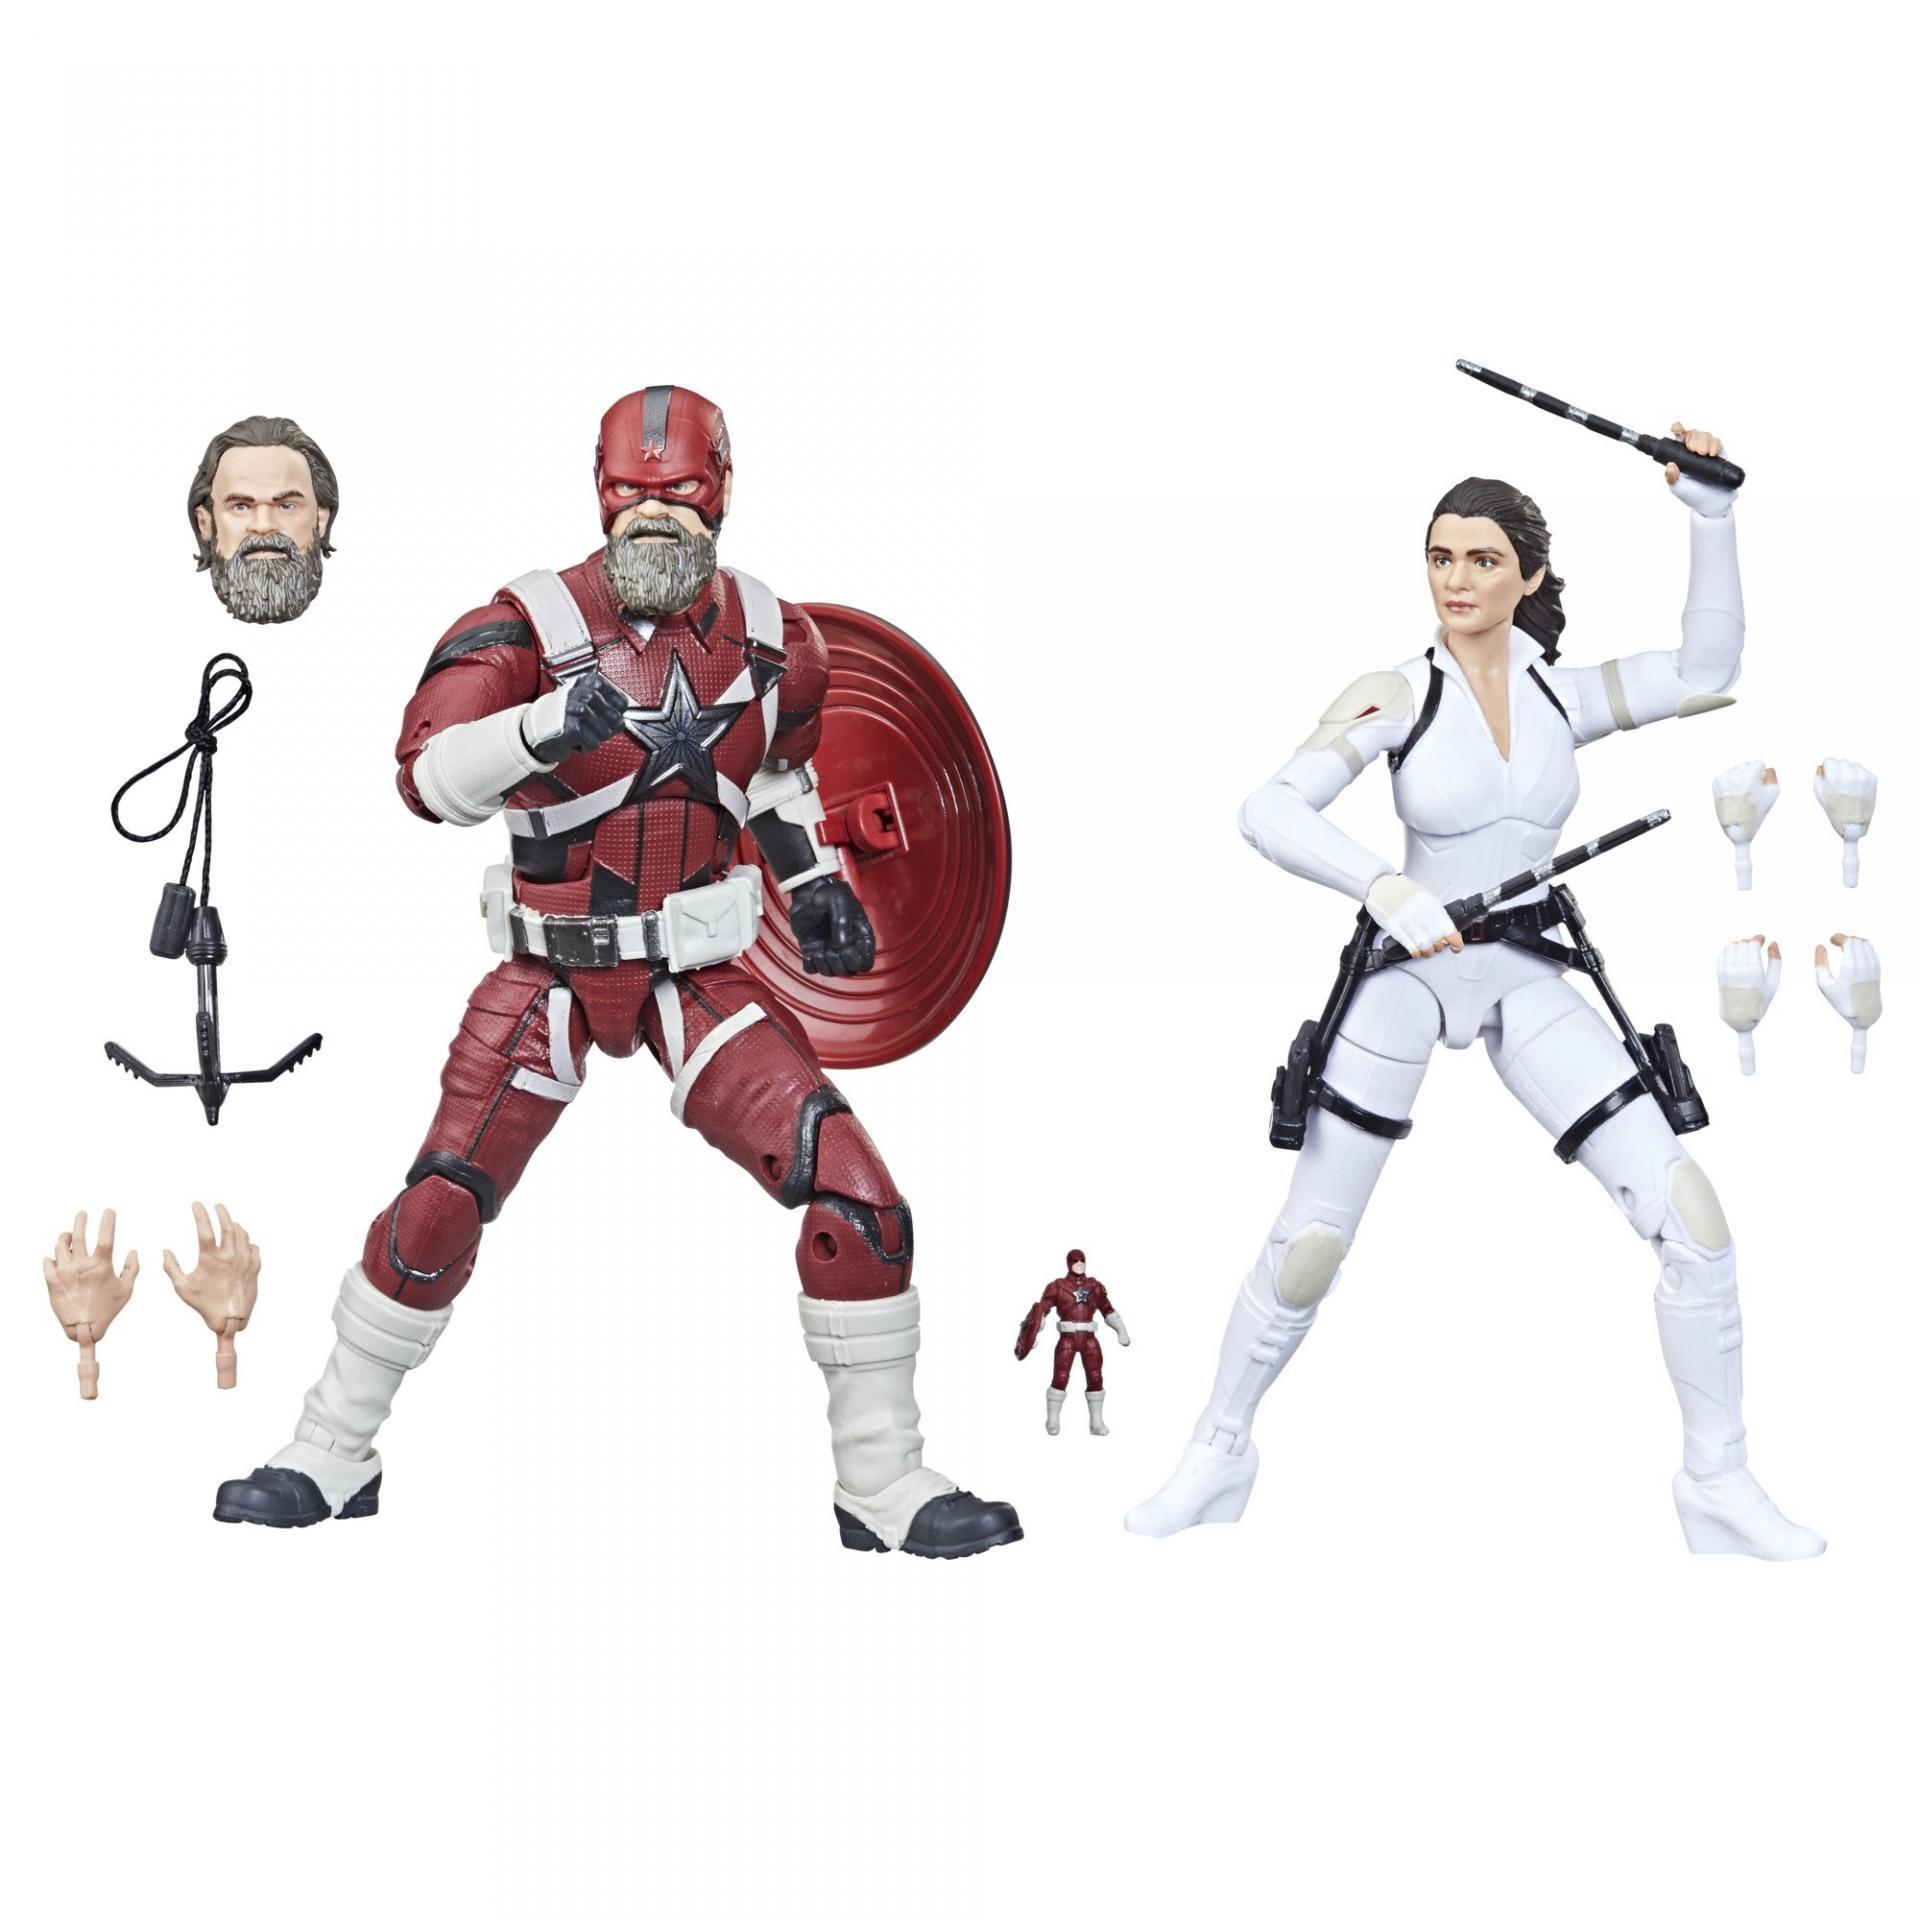 Marvel legends series hasbro red guardian melina vostkoff 2 pack12